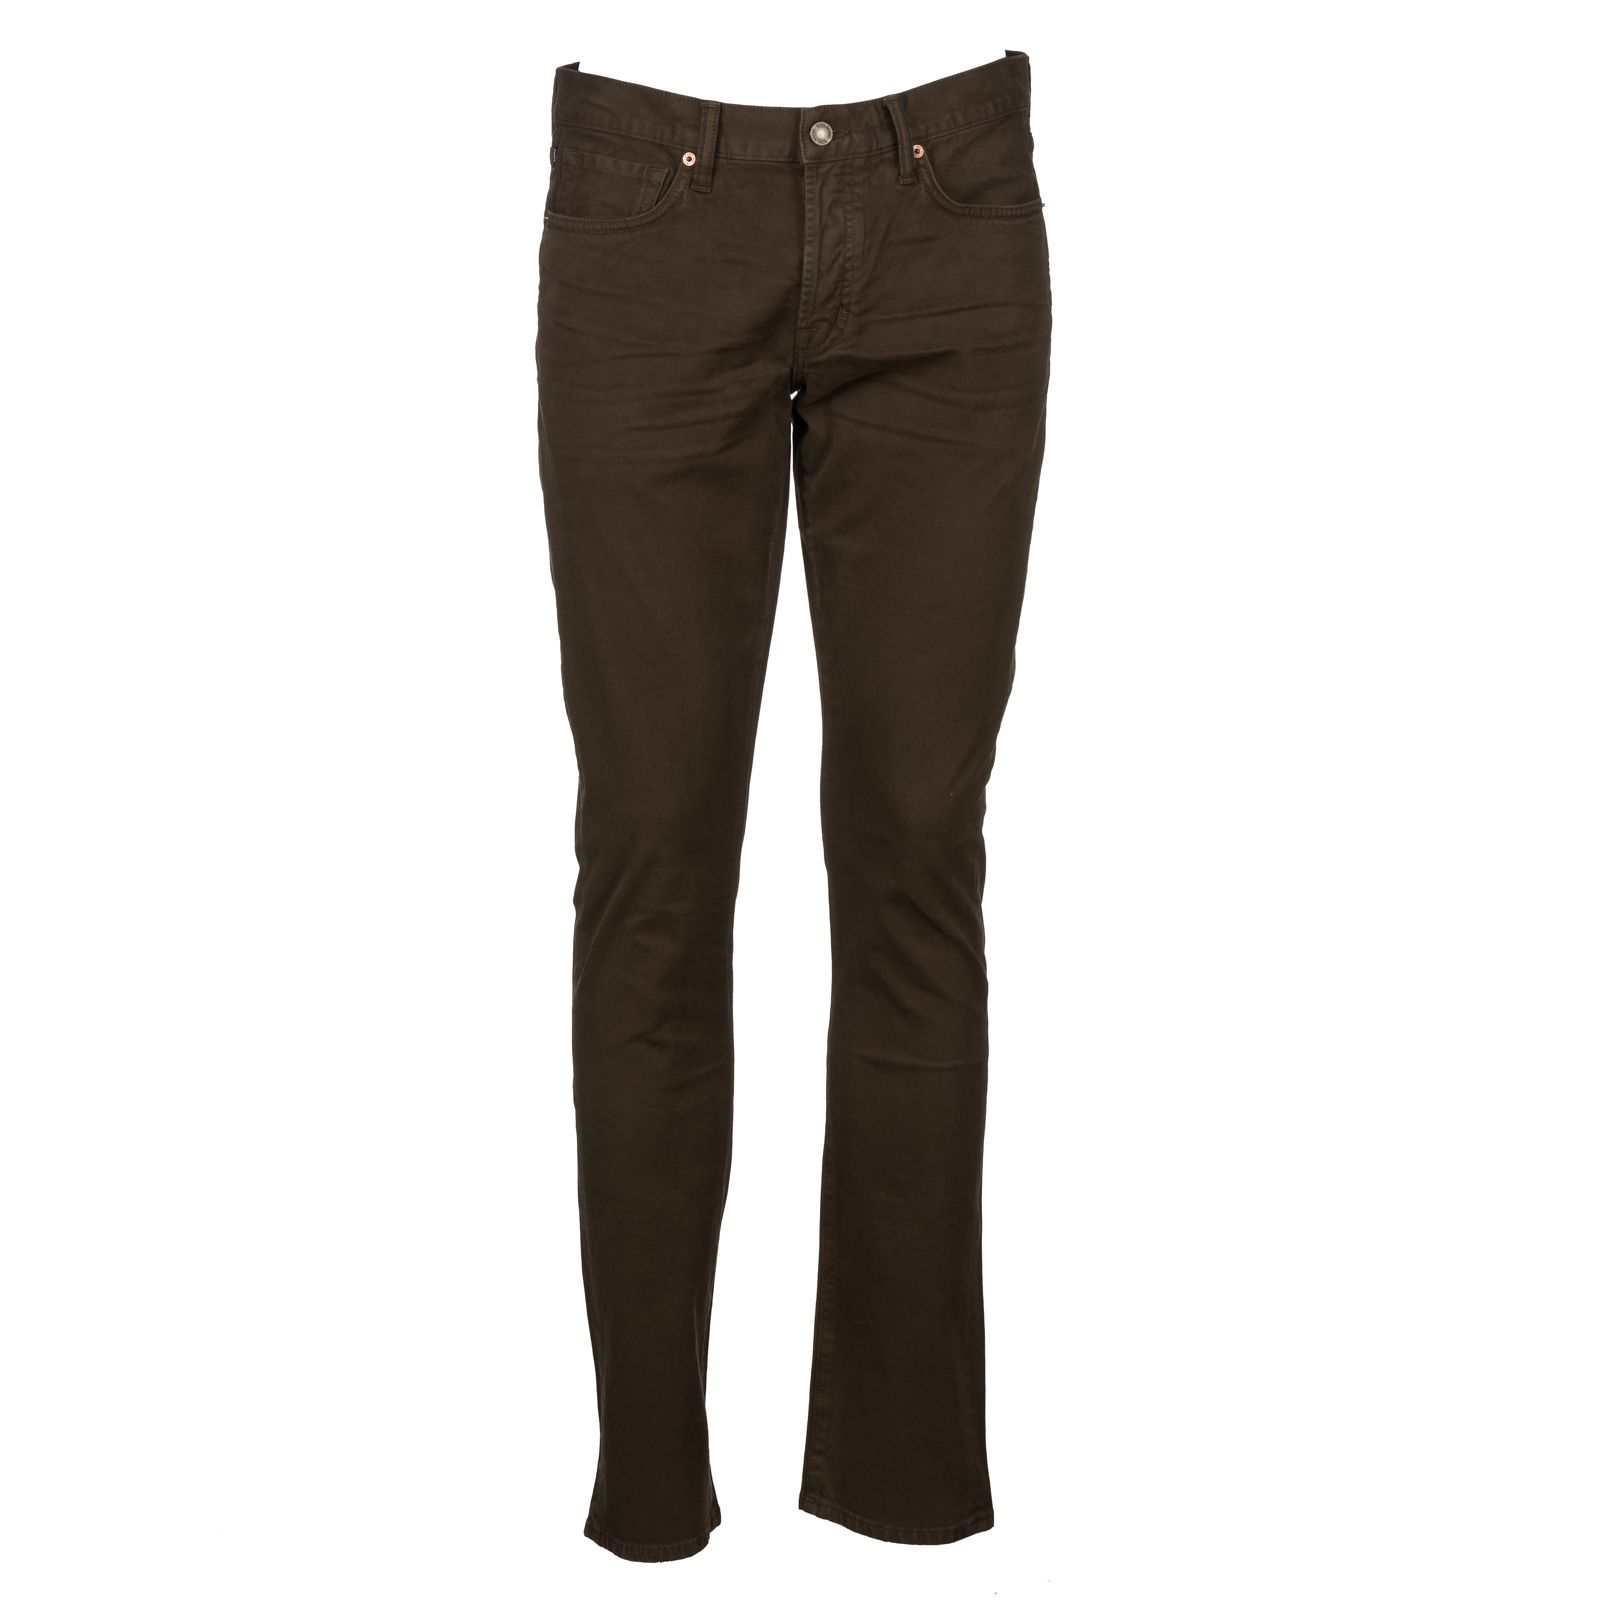 Tom Ford Slim Jeans